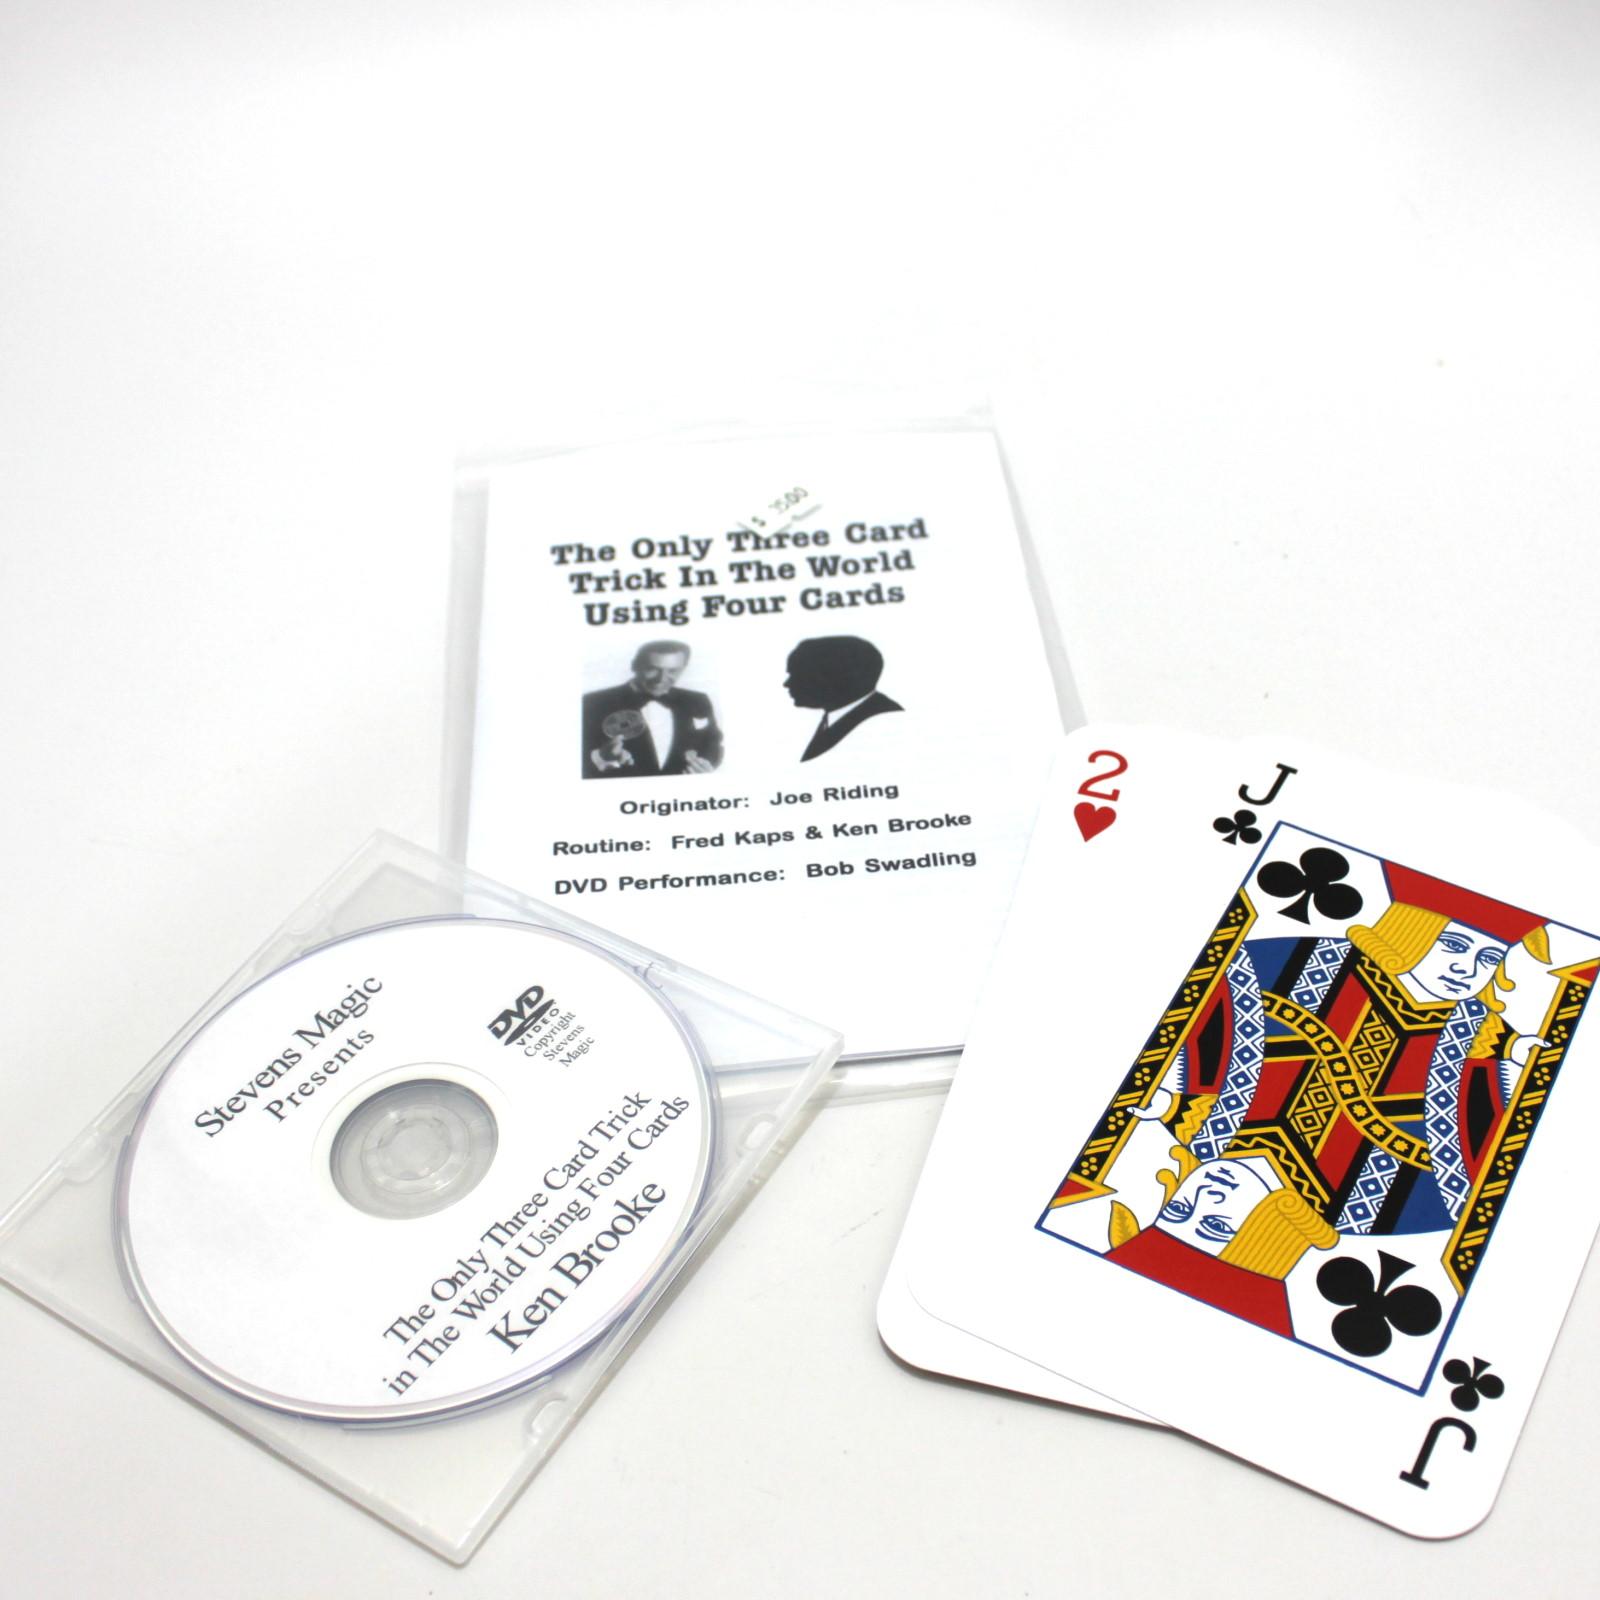 Three Card Four by Joe Riding